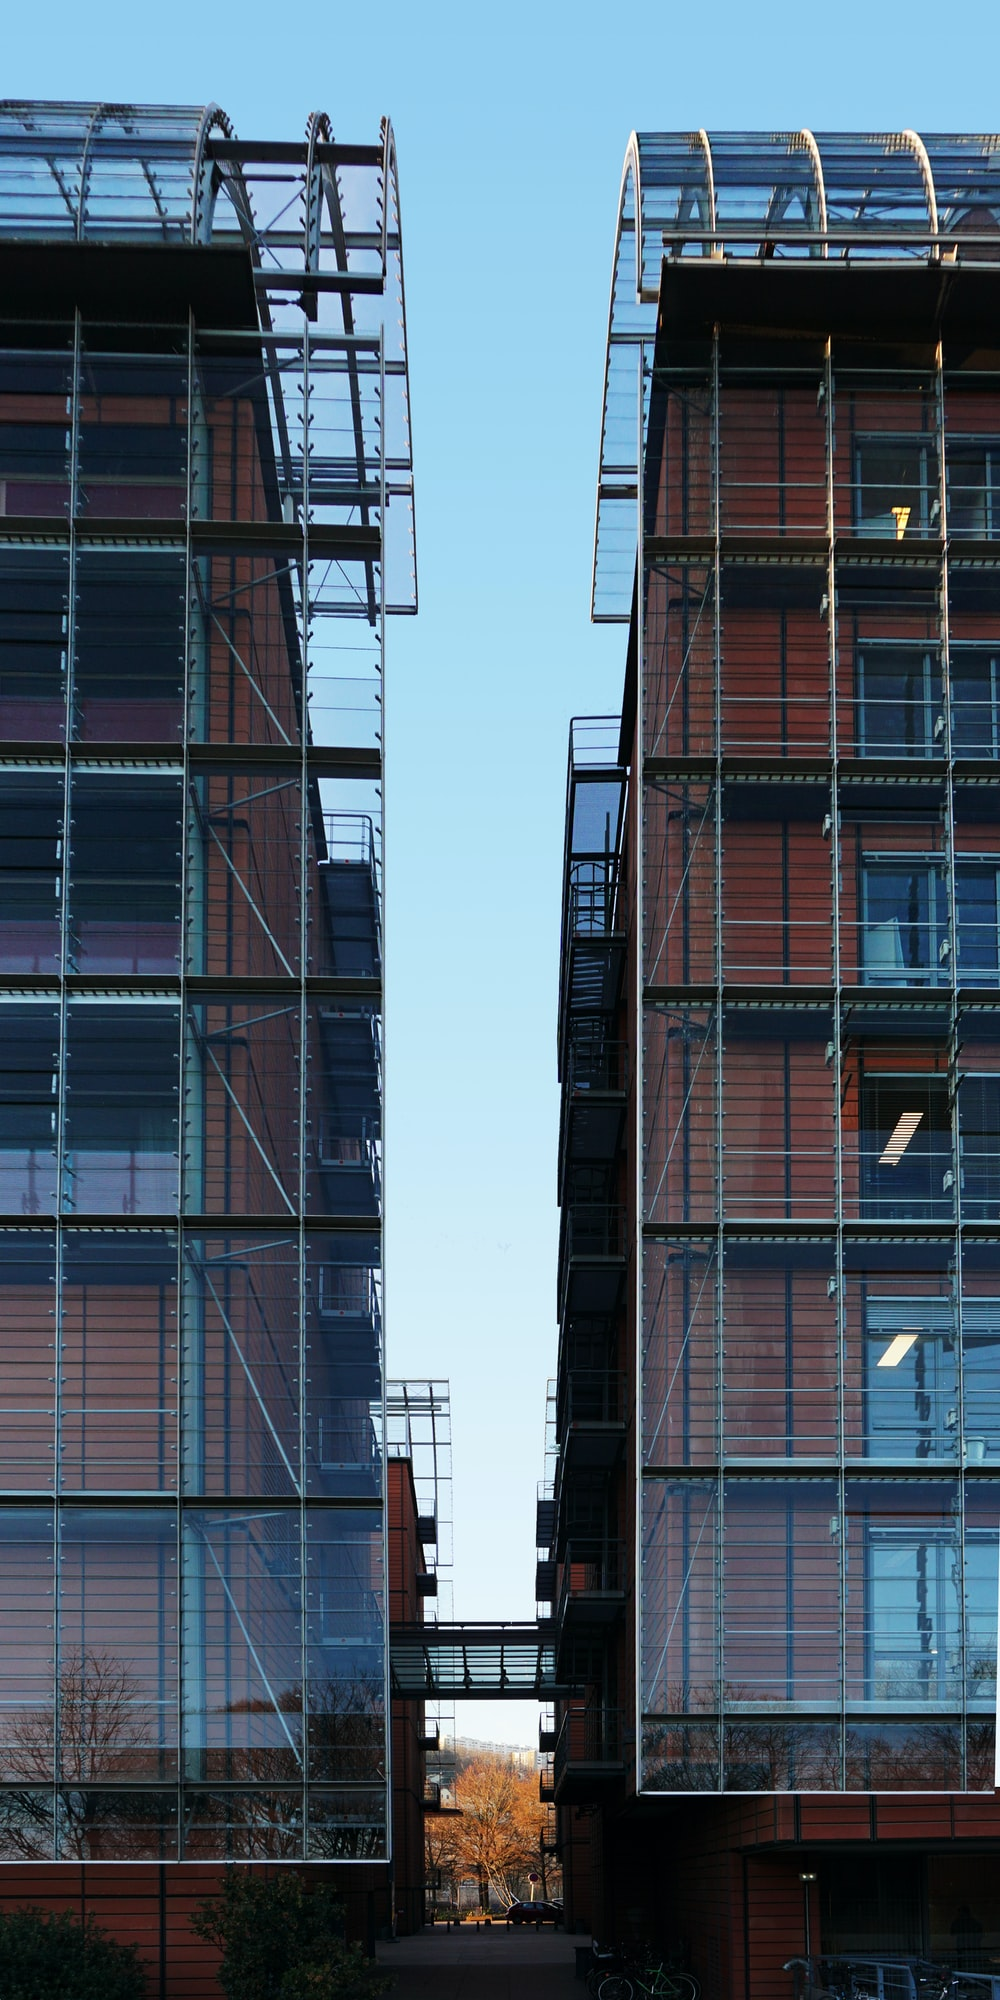 multi-storey highrise buildings during daytime